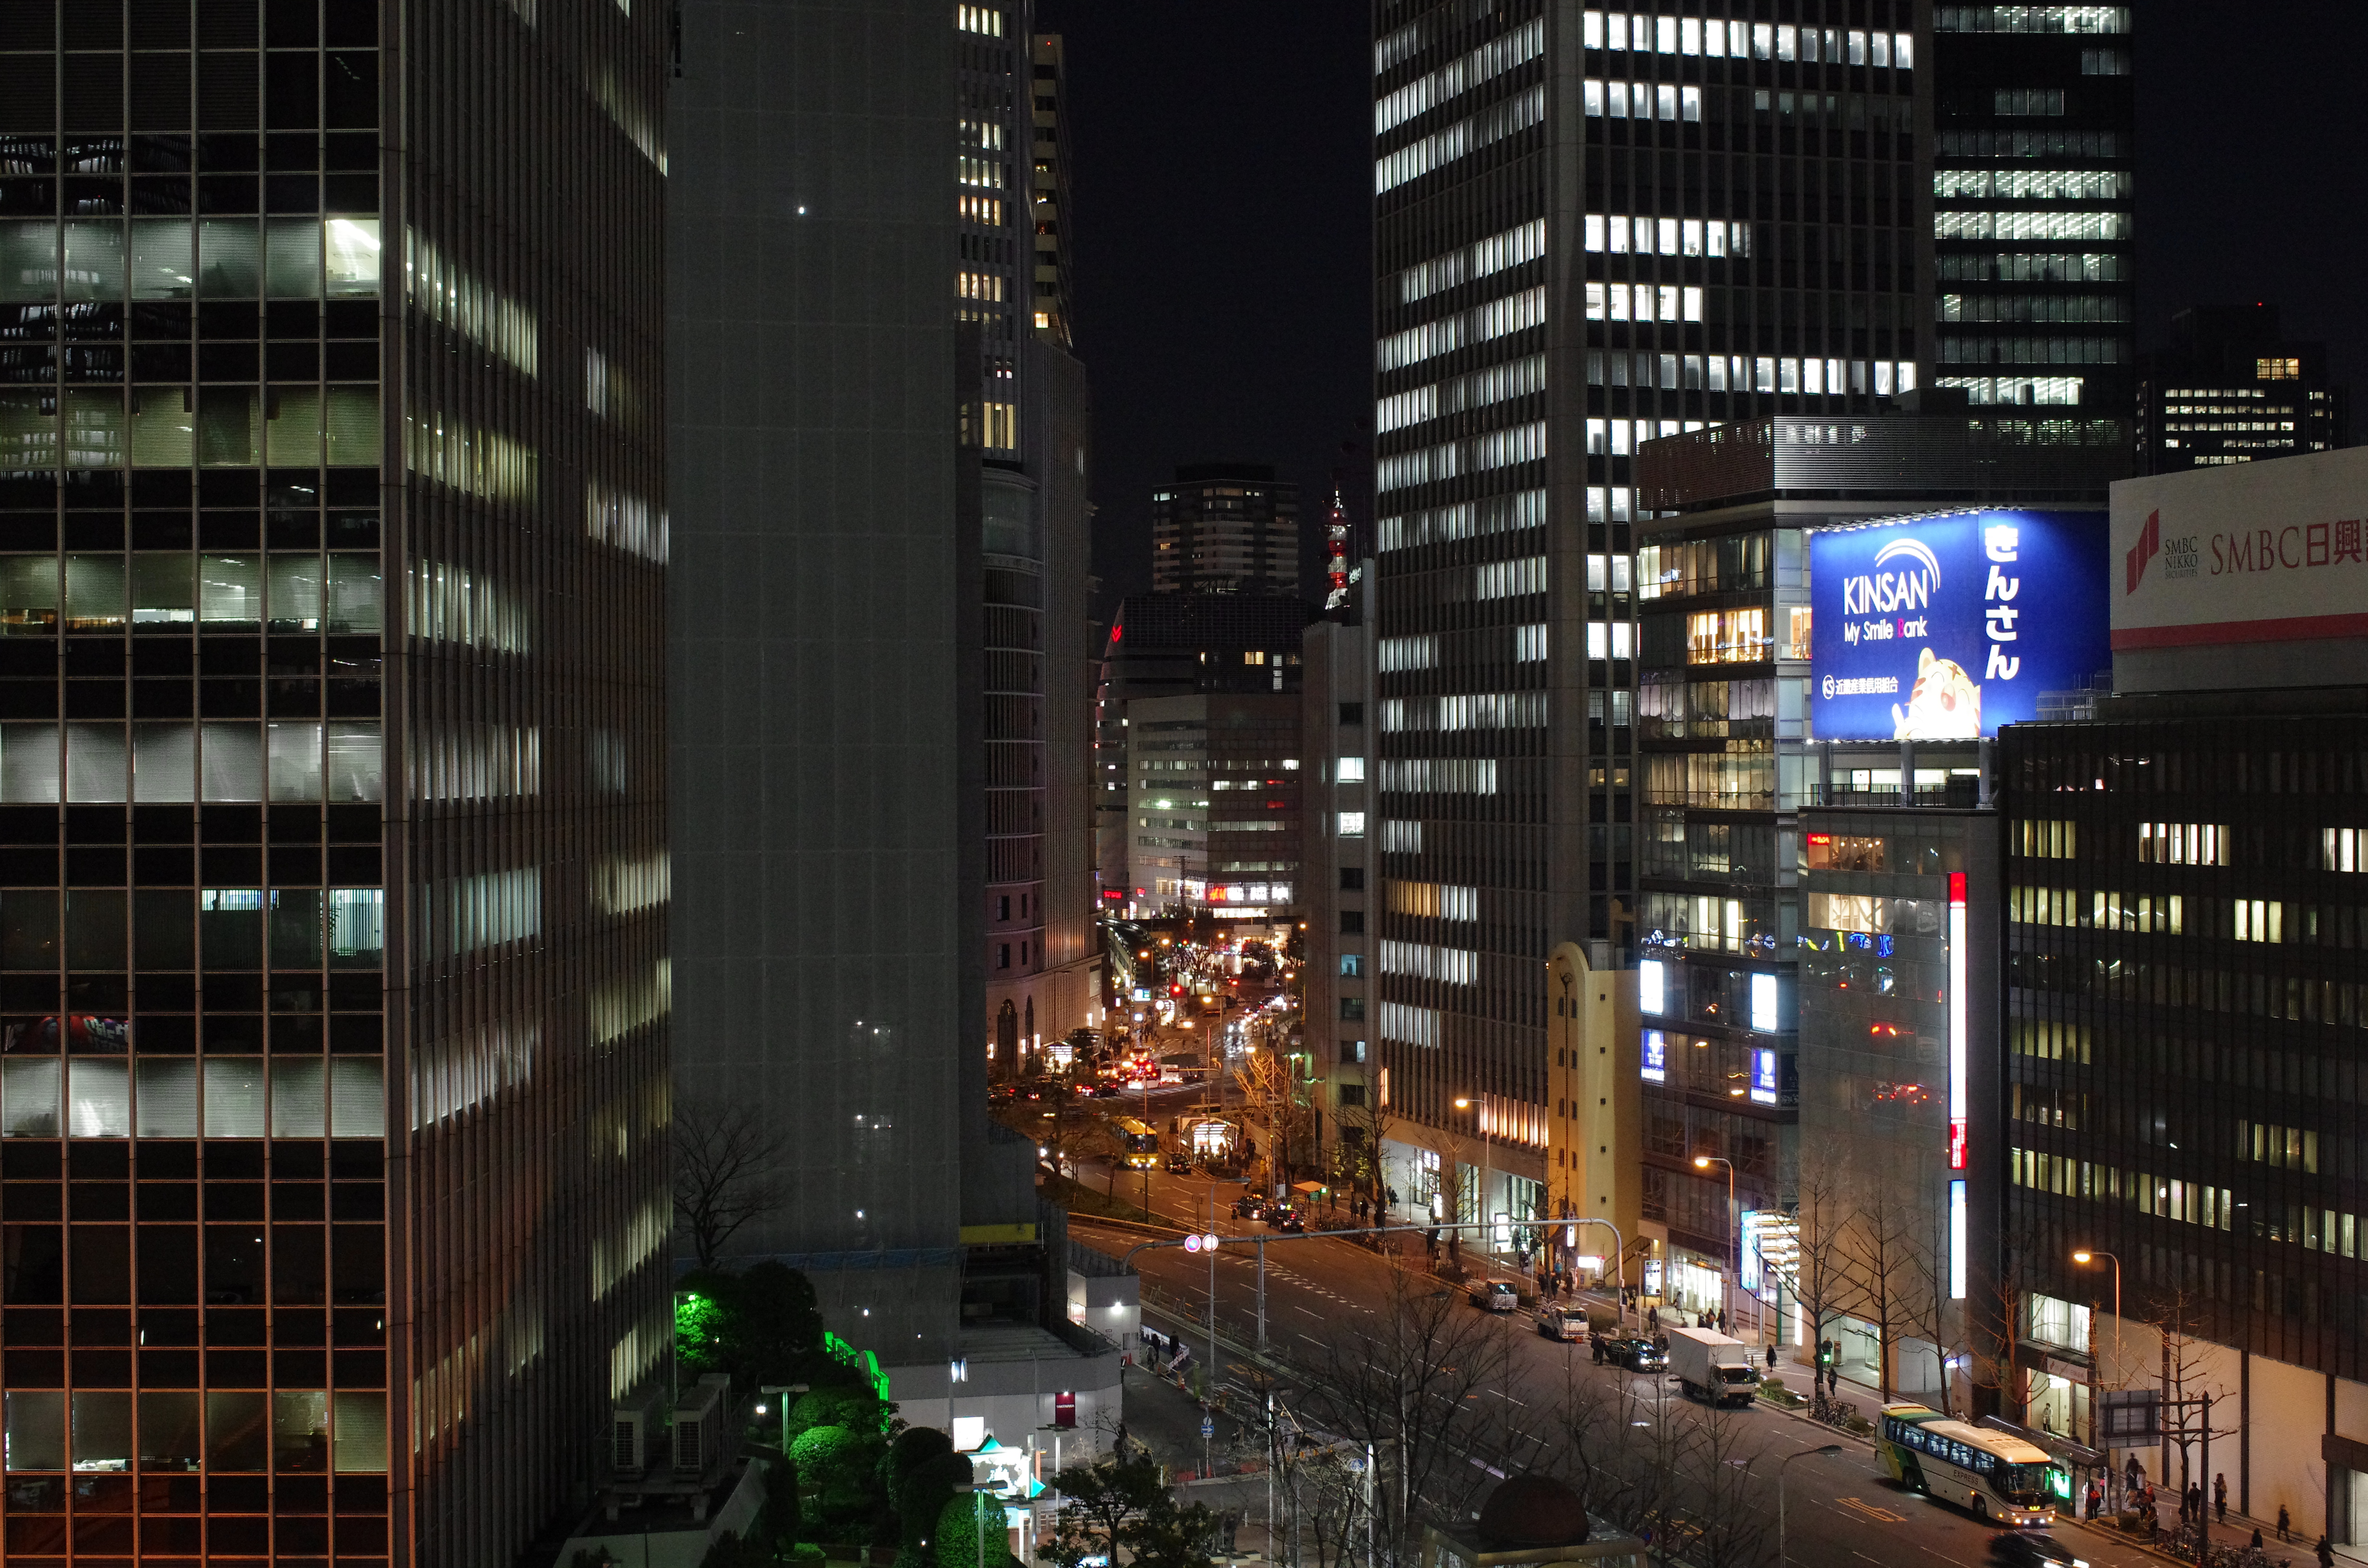 http://www.yaotomi.co.jp/blog/used/night-k5iis-3200.JPG